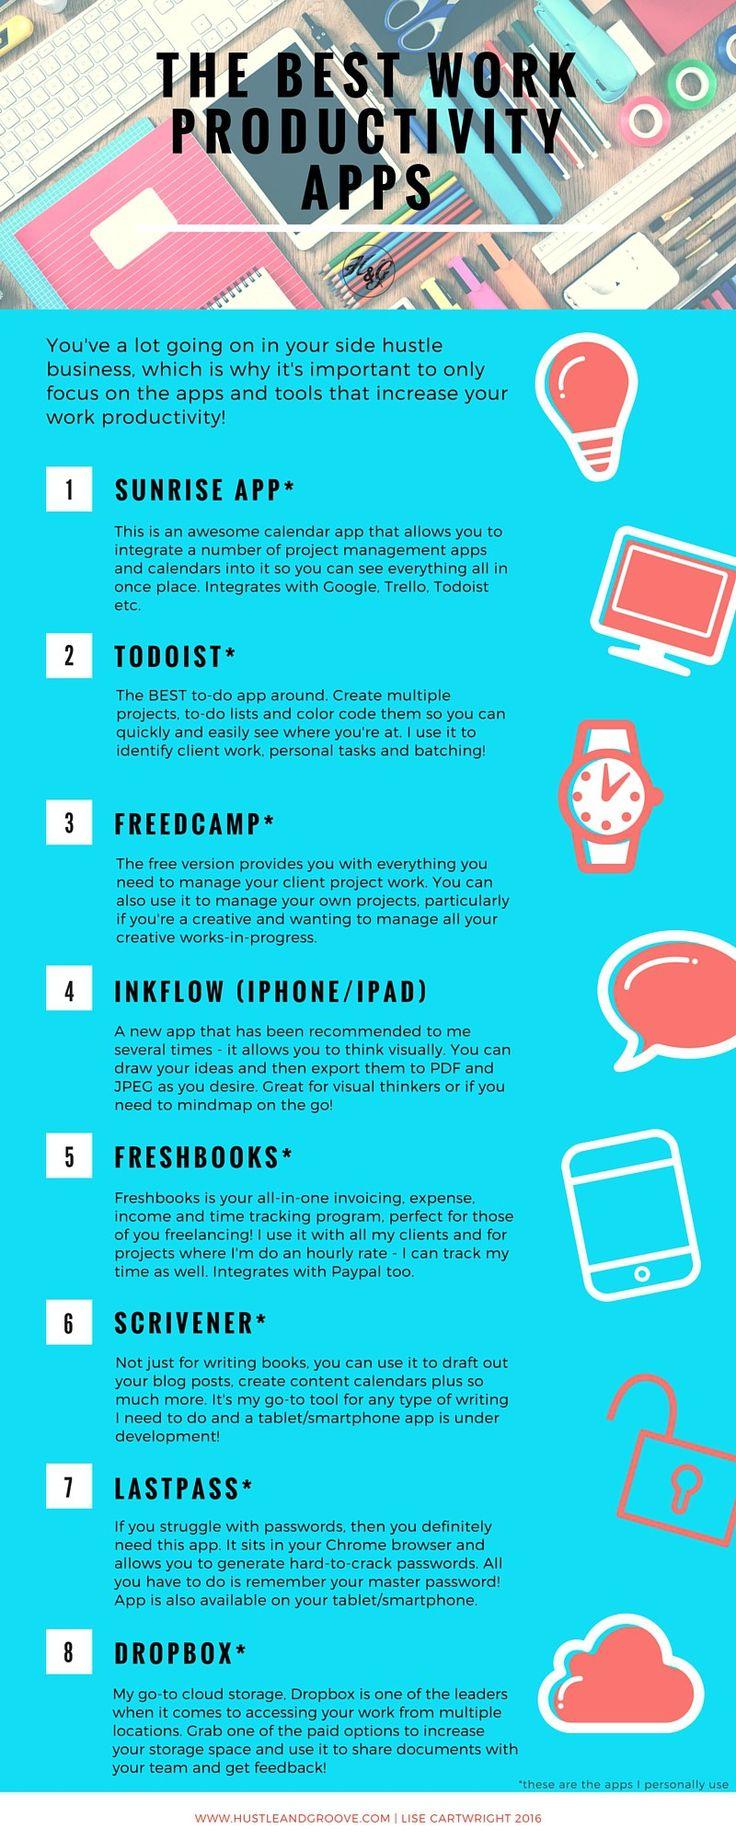 32 best Productivity images on Pinterest | Productivity, Personal ...